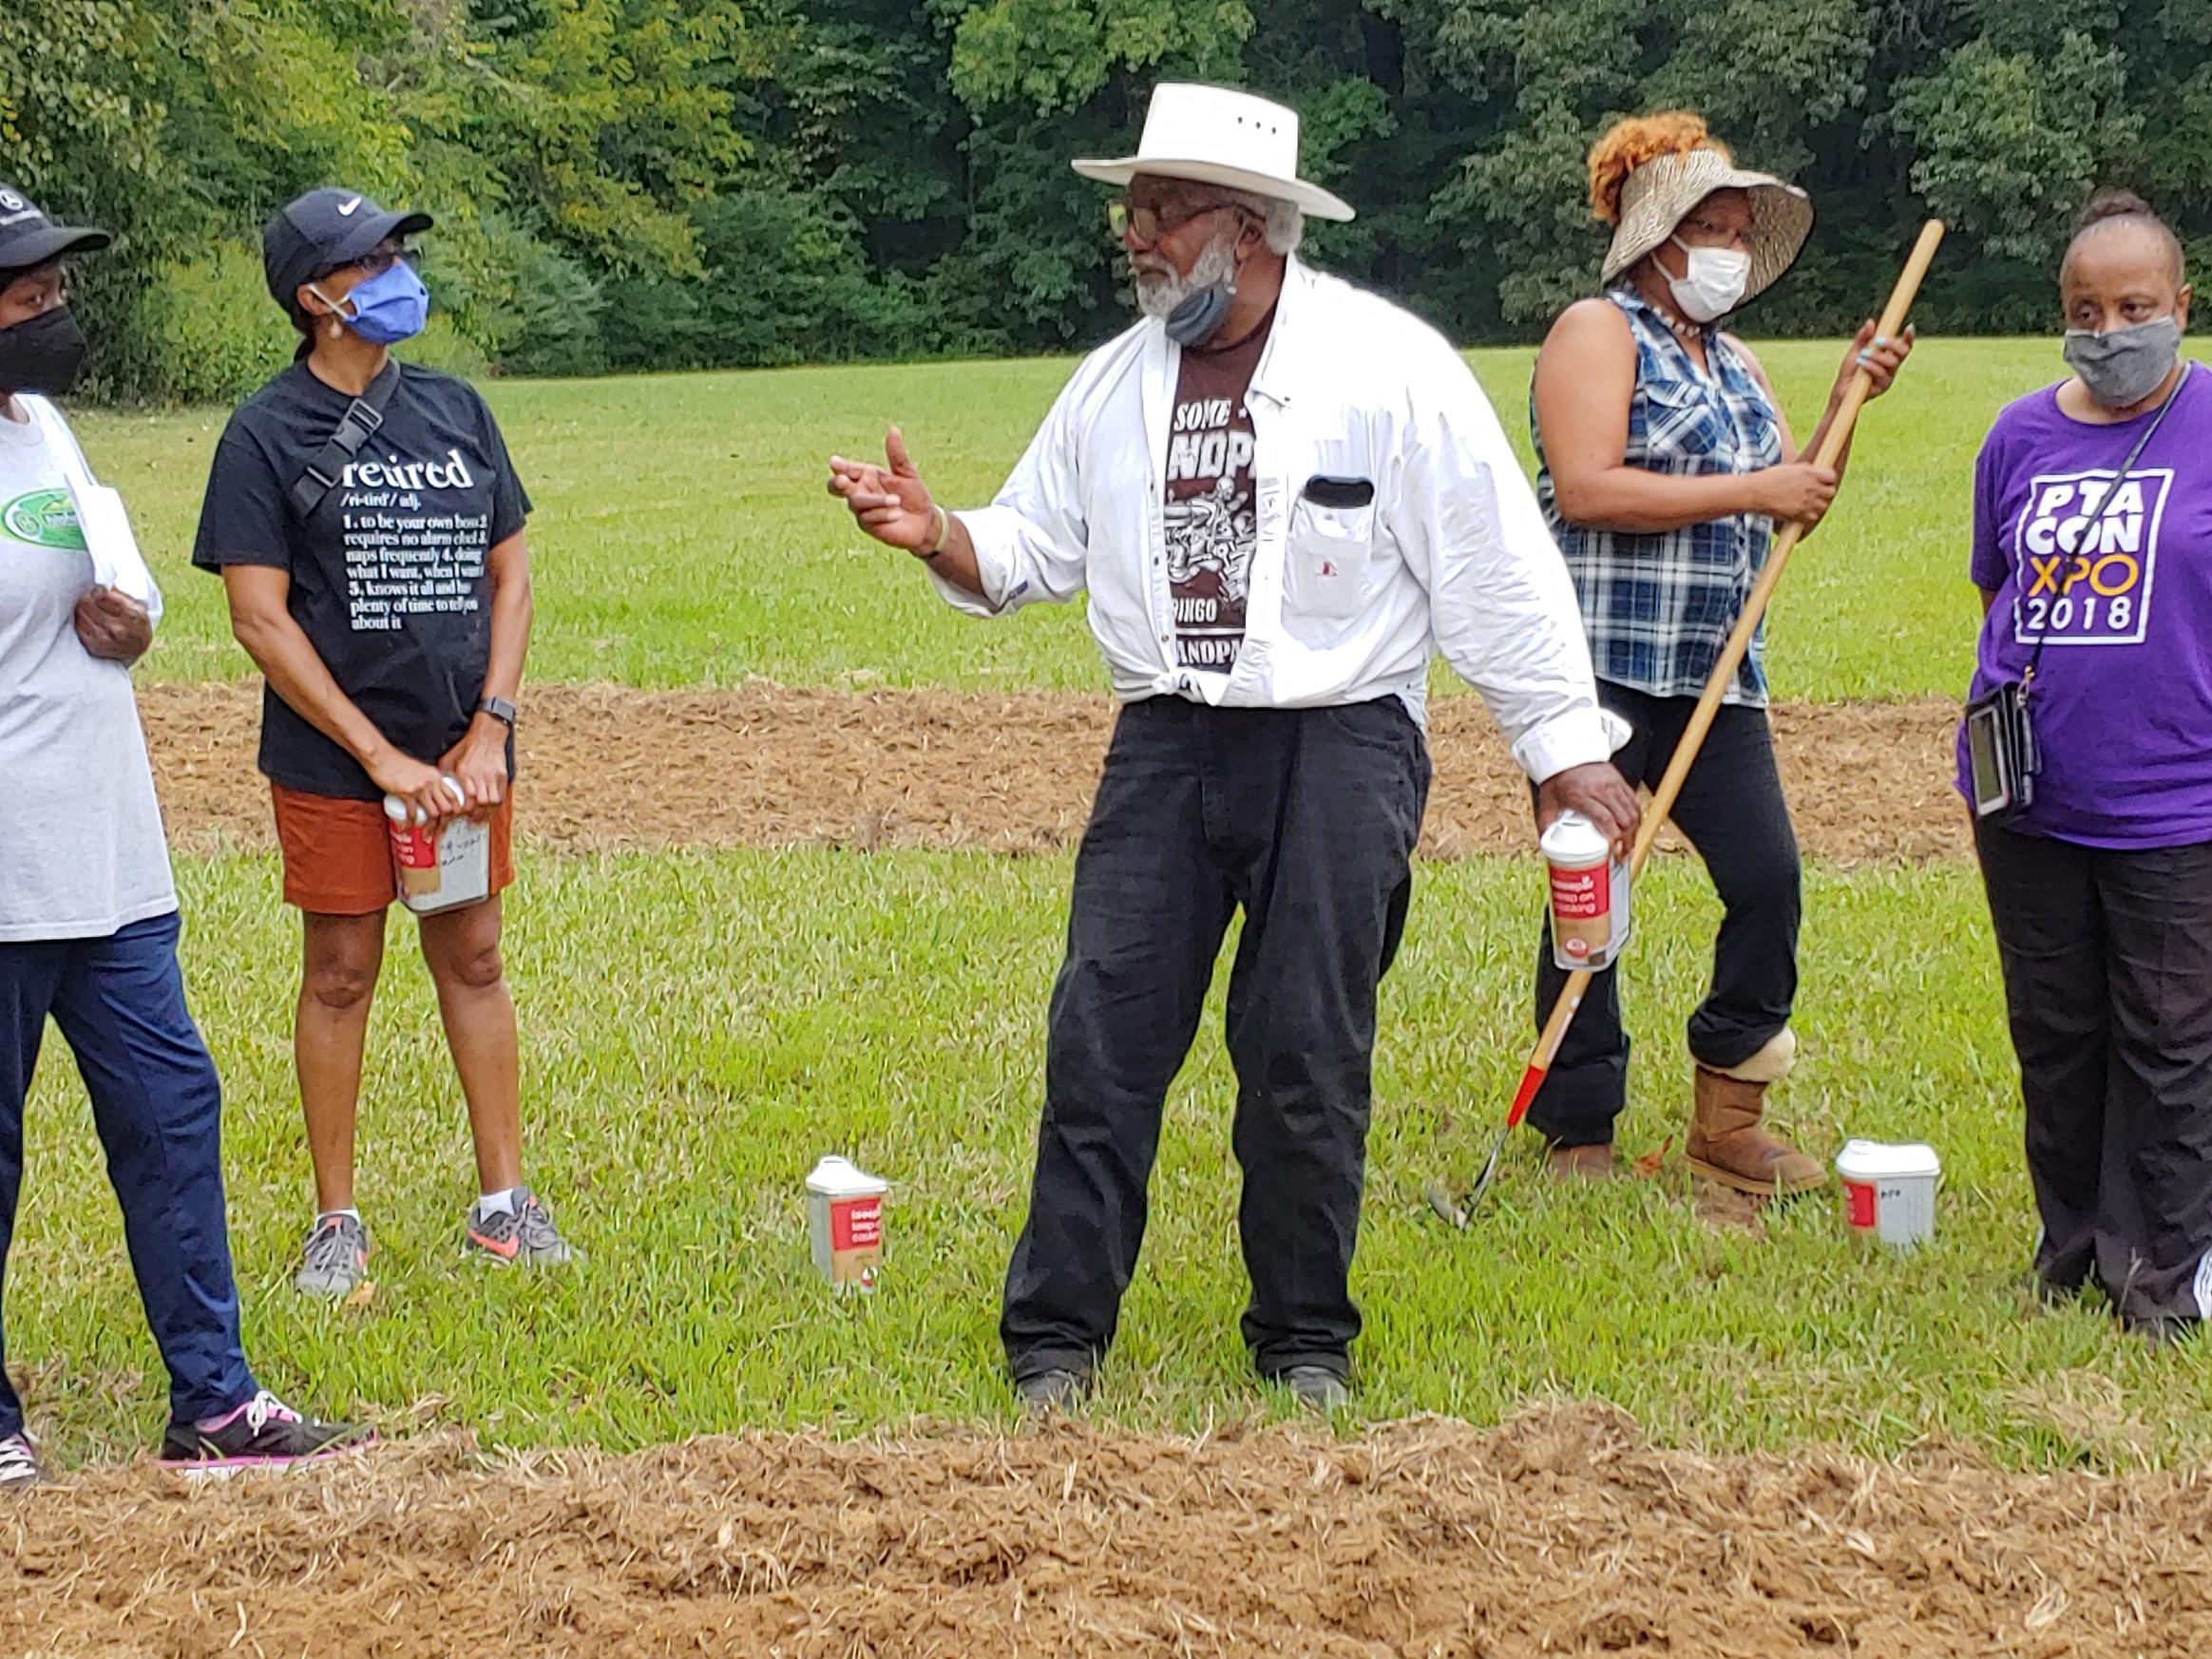 Urban gardening volunteer Ernest Trice explains planting to area residents in the new Frayser Community Garden.